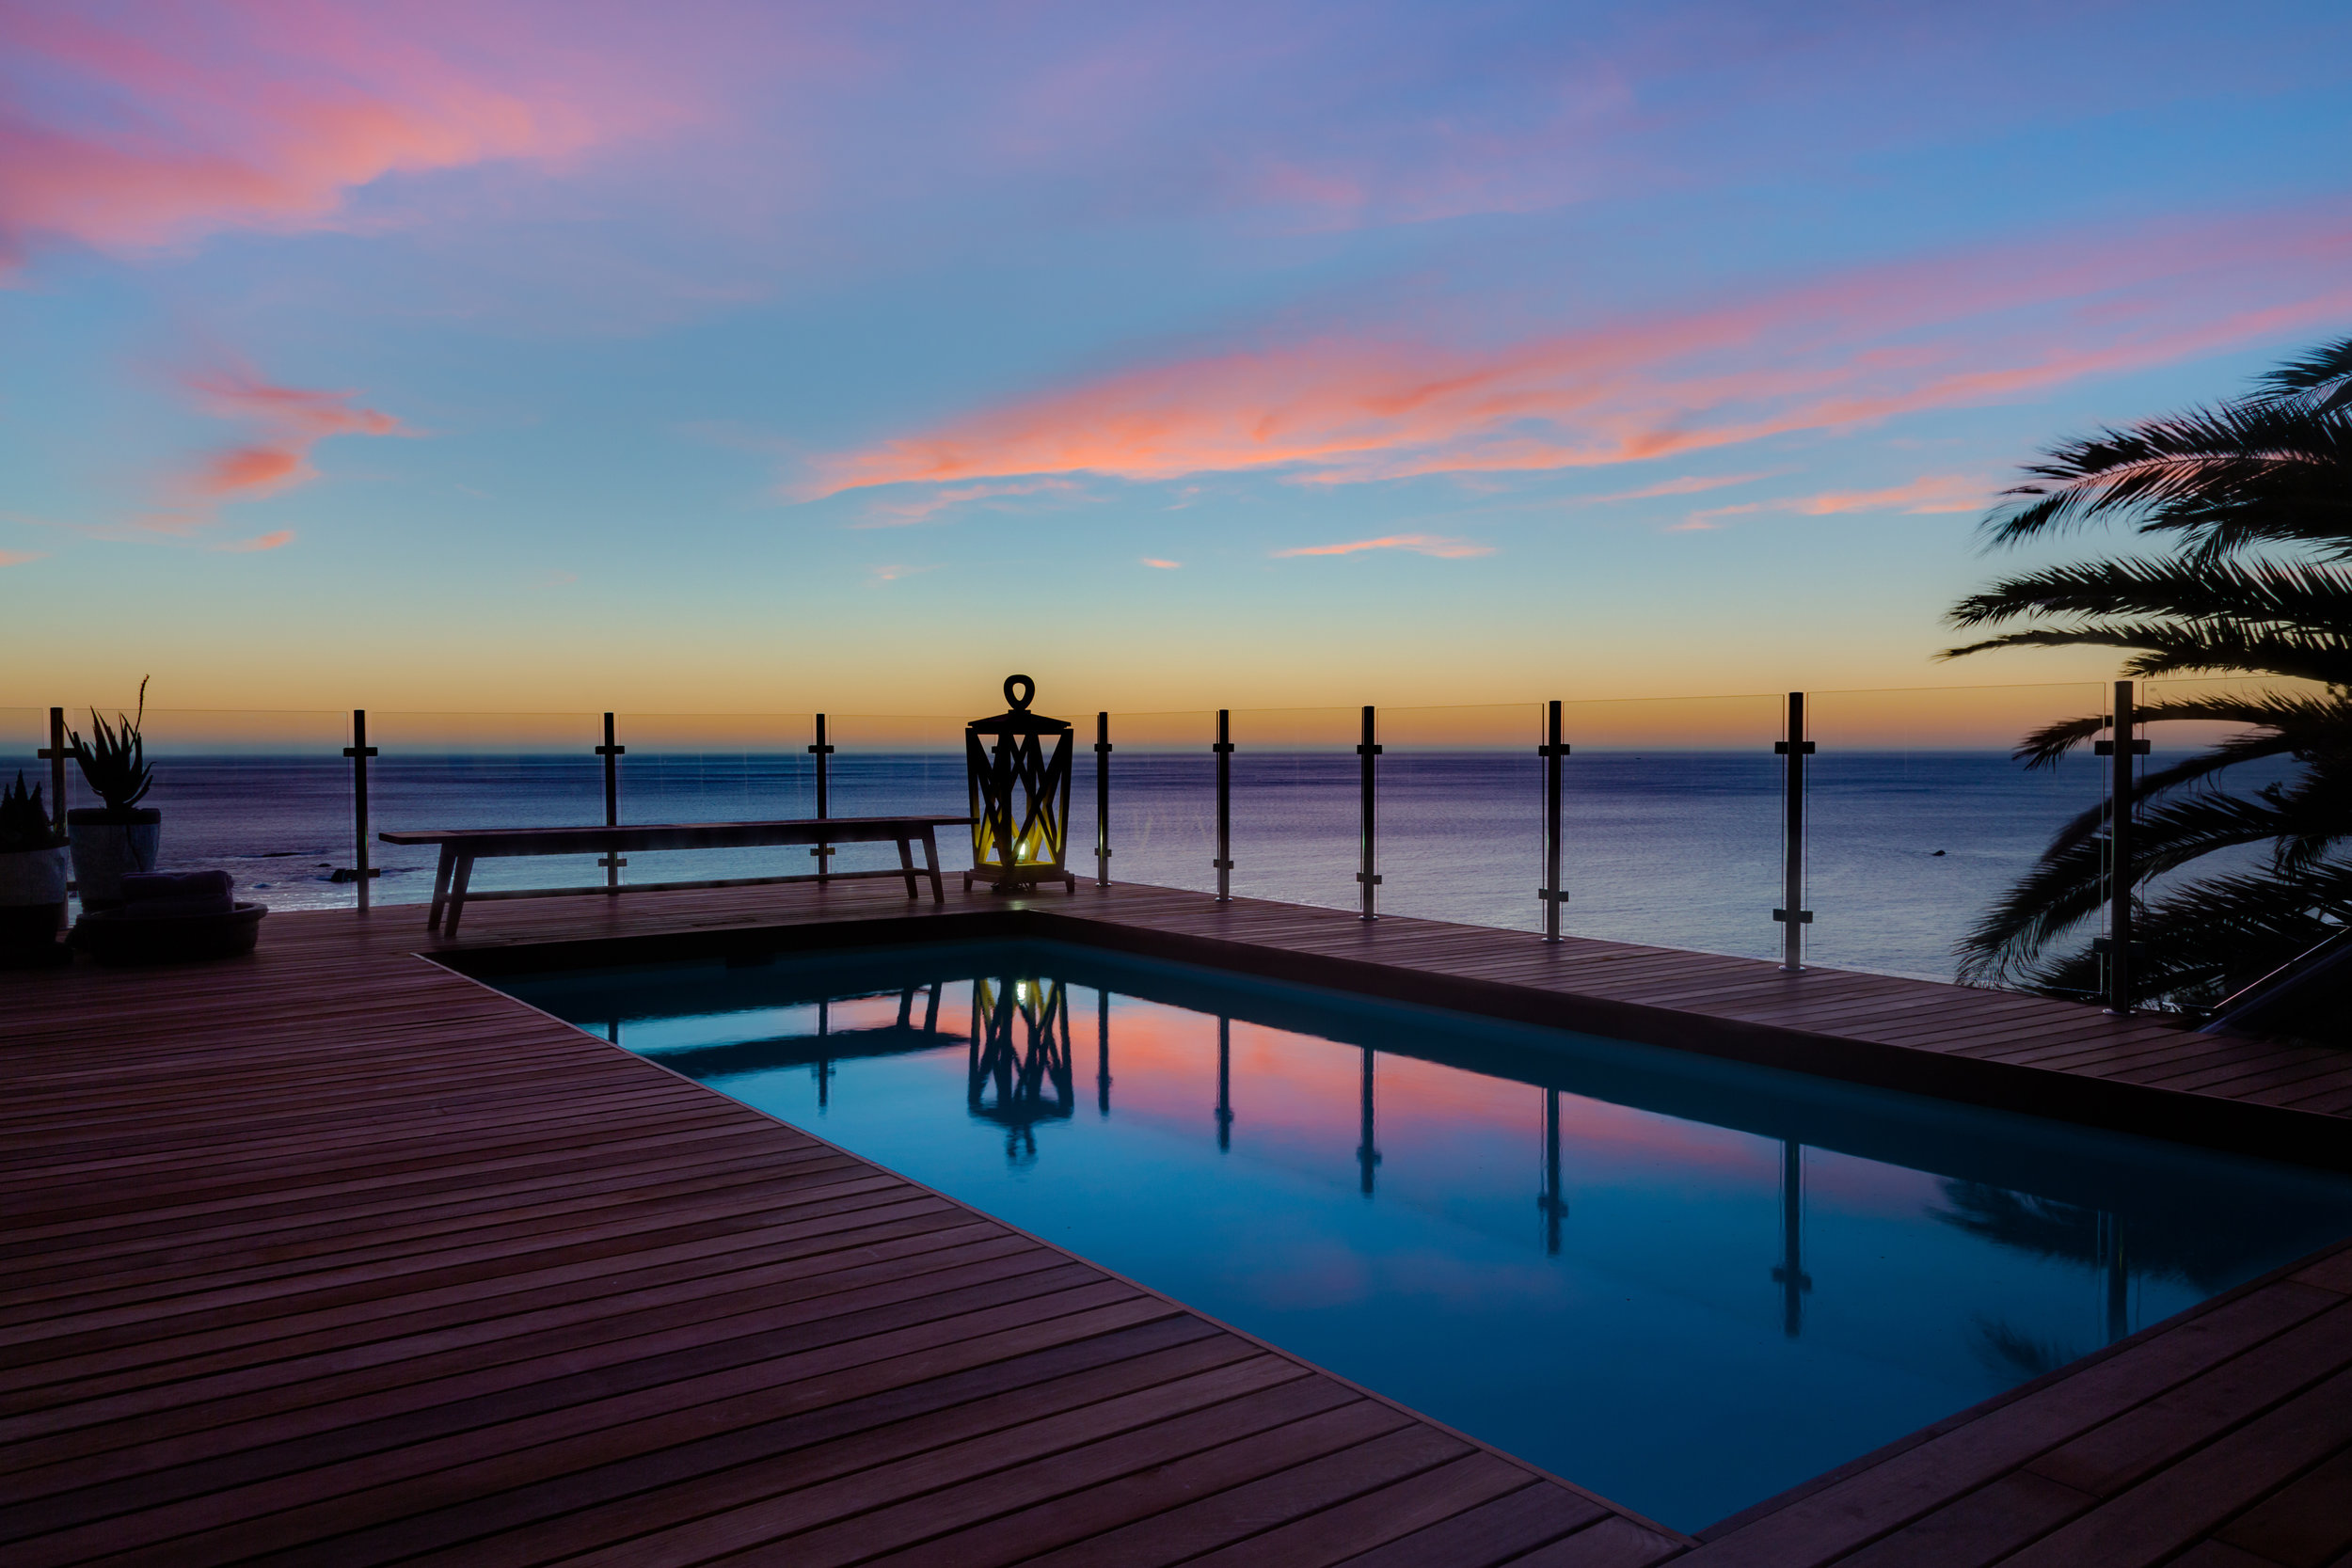 sunset-on-pool-deck-5.jpg